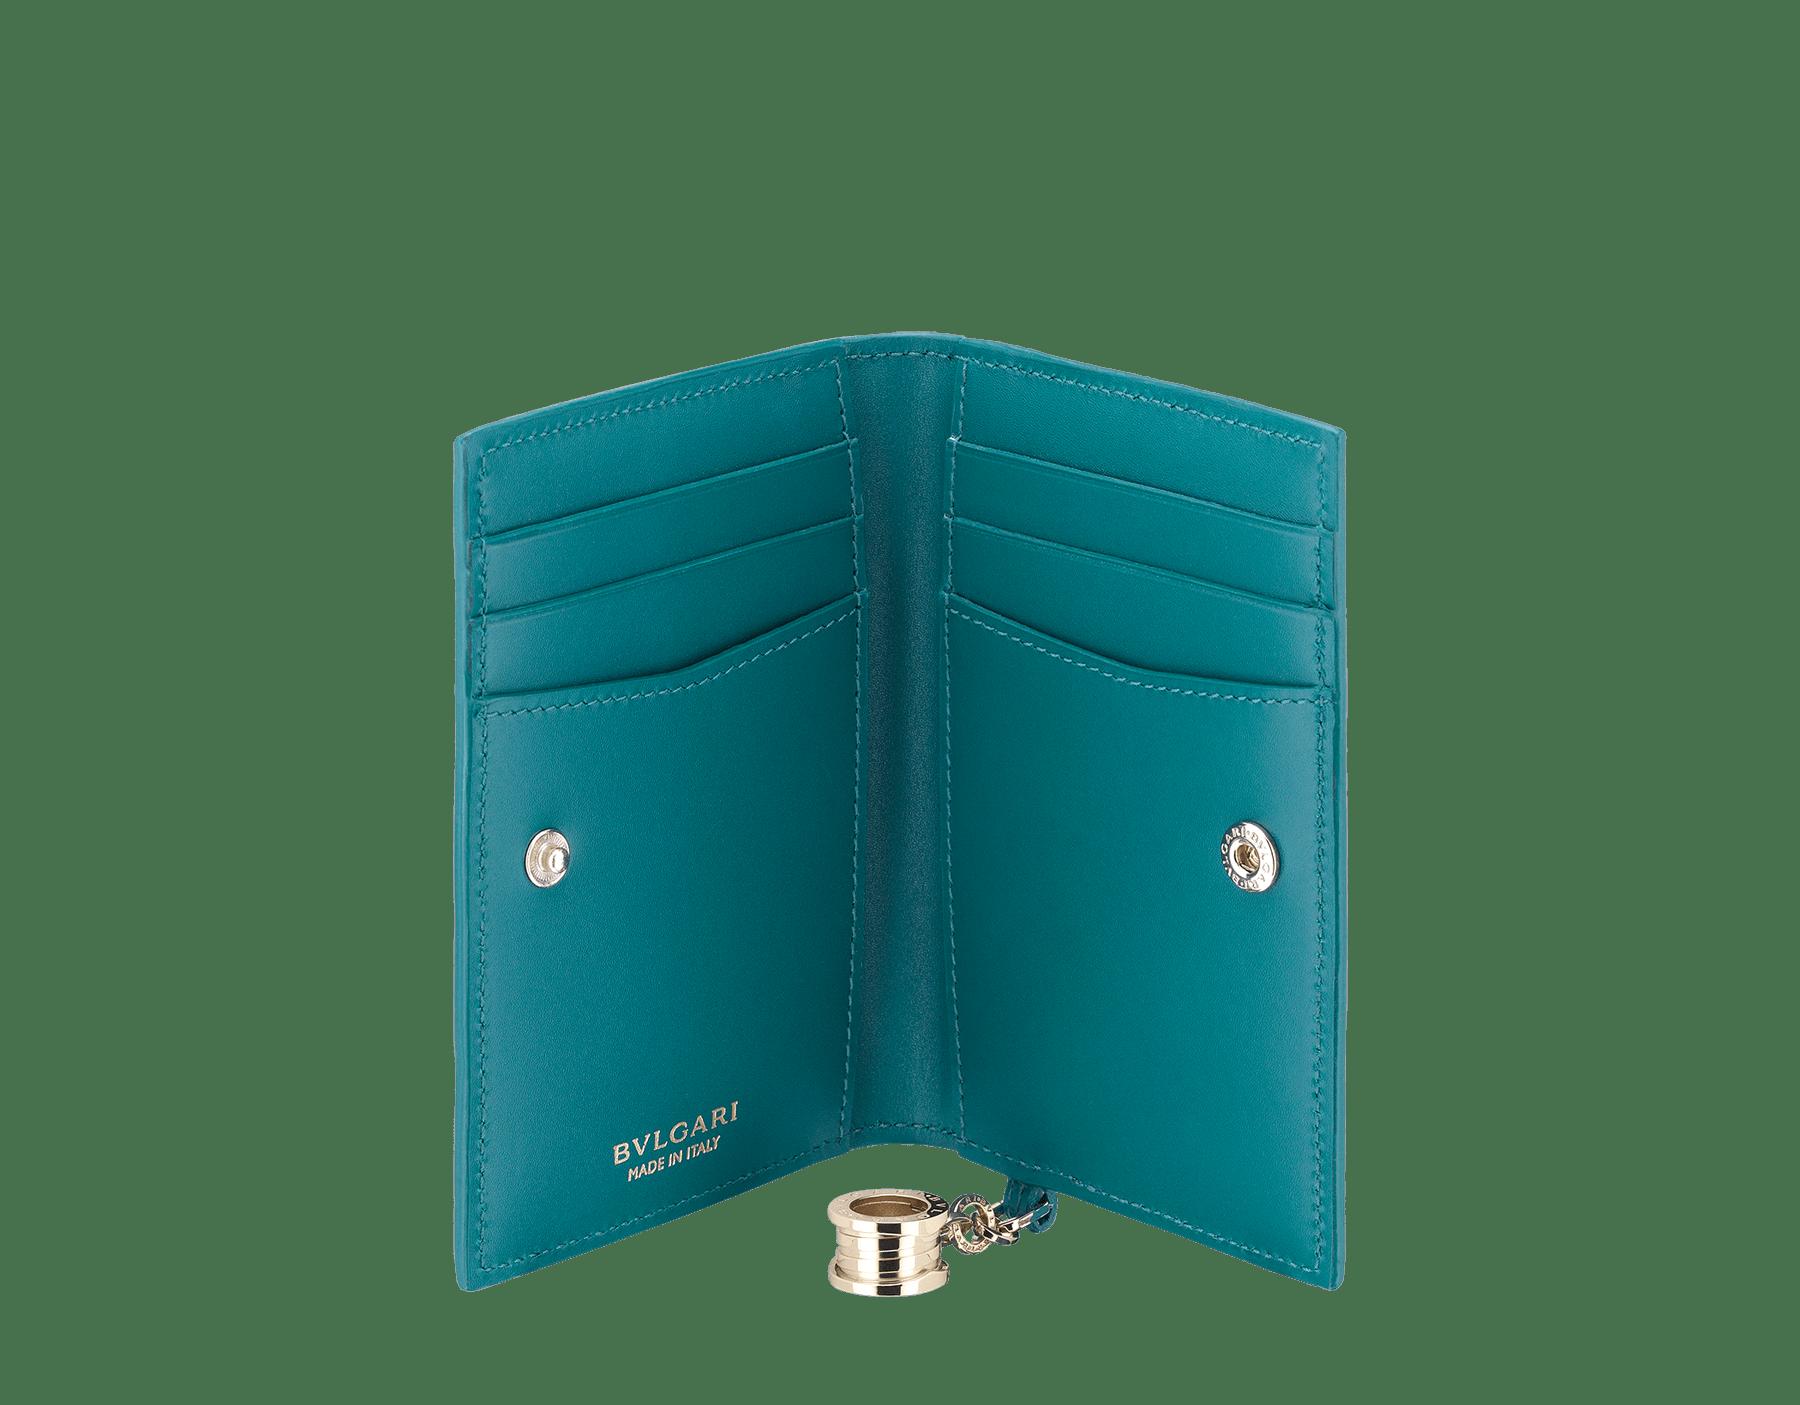 B.Zero1 熱帶綠松石色和深綠玉色羊皮折式信用卡夾。經典 B.Zero1 淡金色黃銅吊飾。 288238 image 2